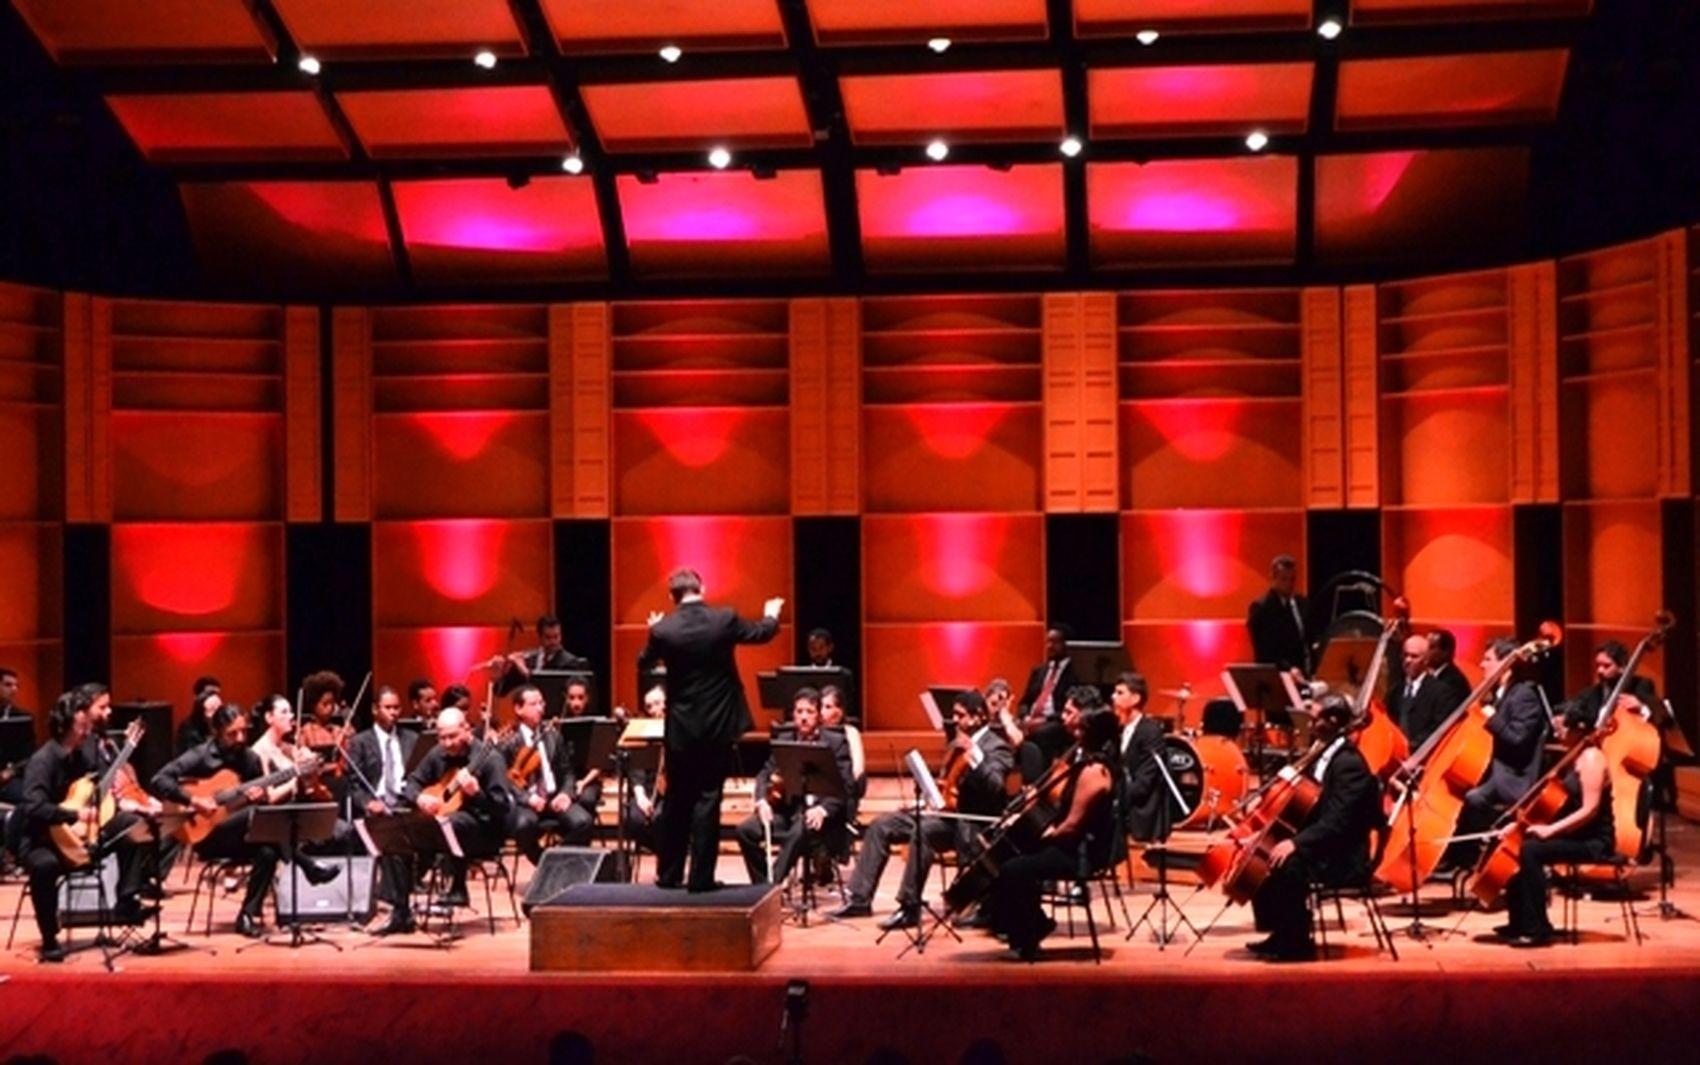 Orsse realiza Festival de Música Russa no Teatro Atheneu - Noticias